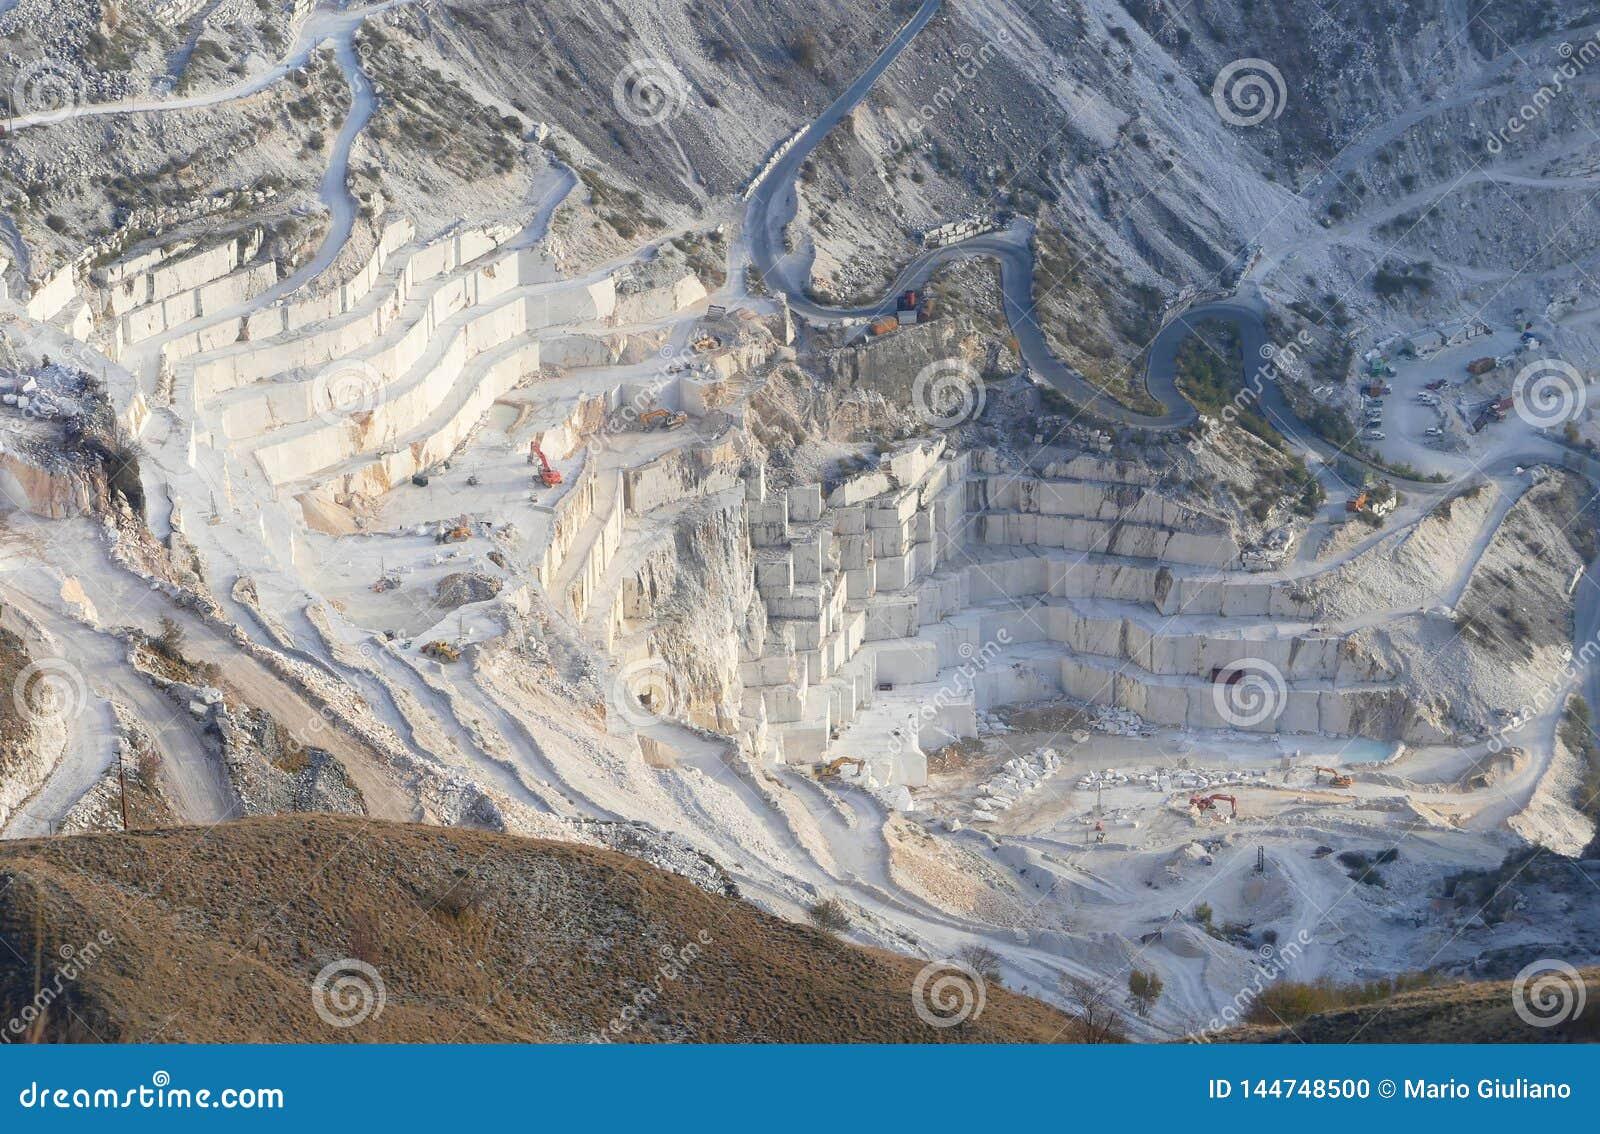 The marble quarries at Carrara